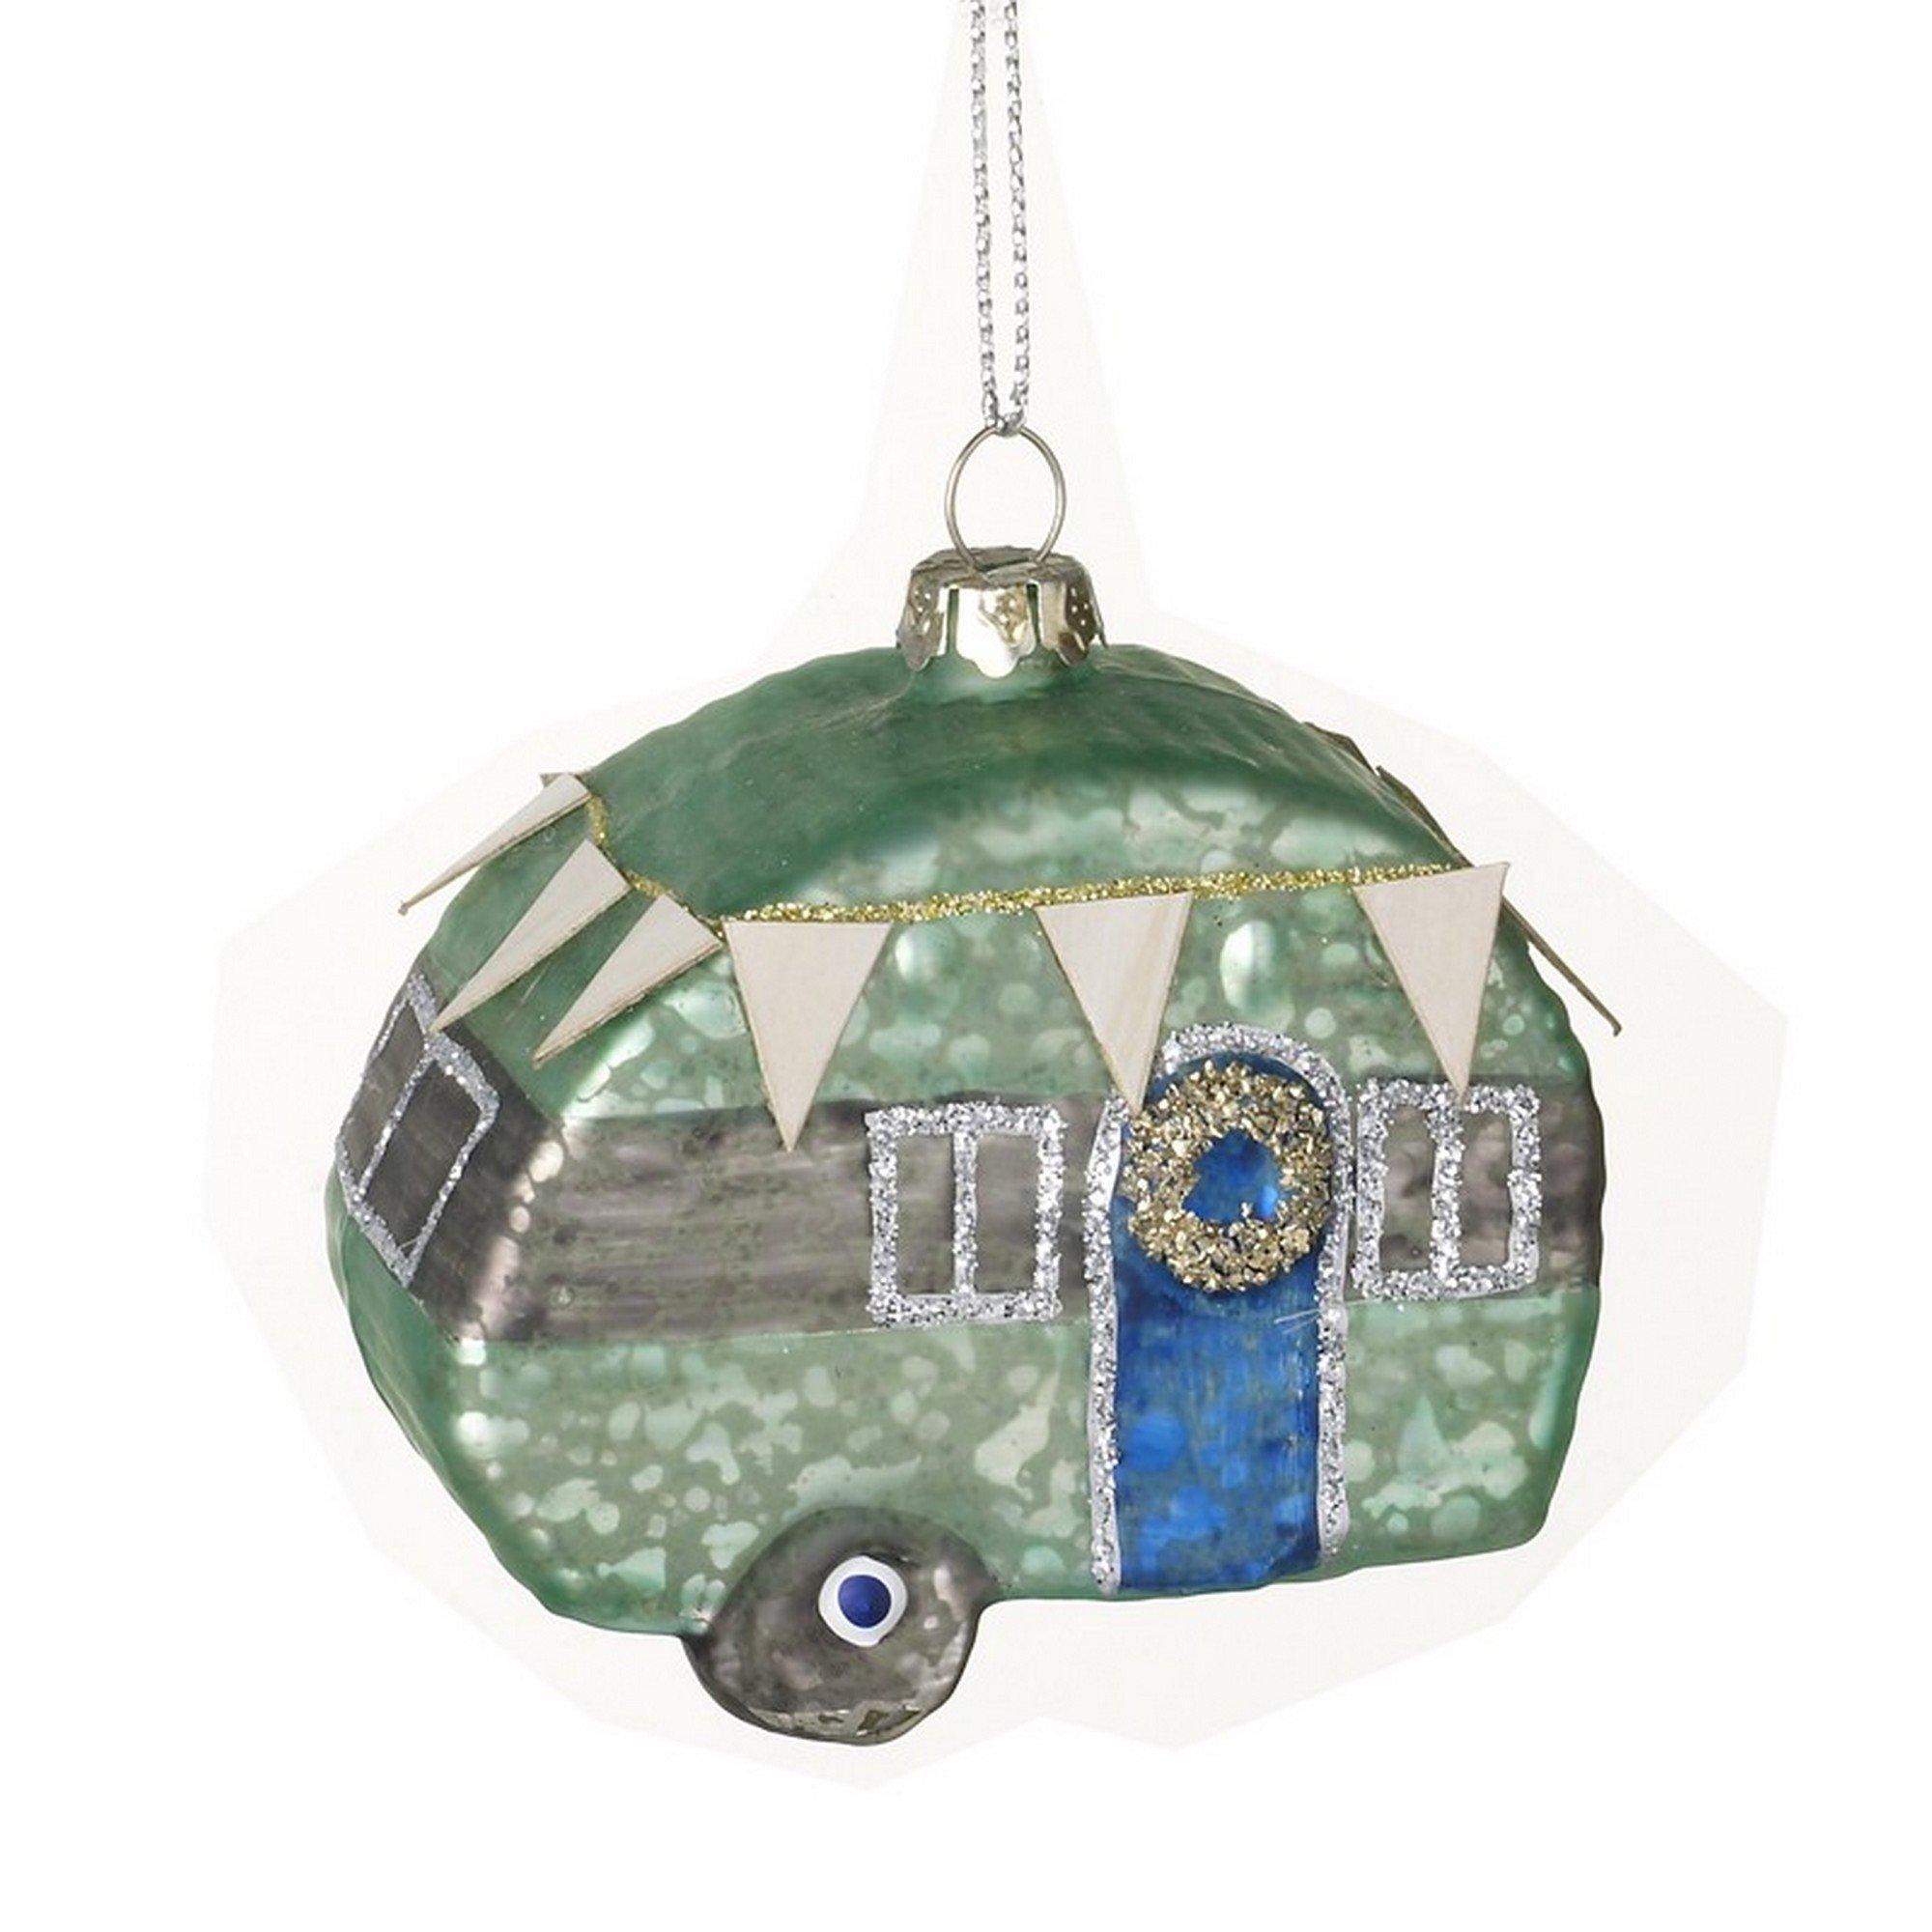 Heaven Sends Glass Hanging Caravan Decoration (One Size) (Green)